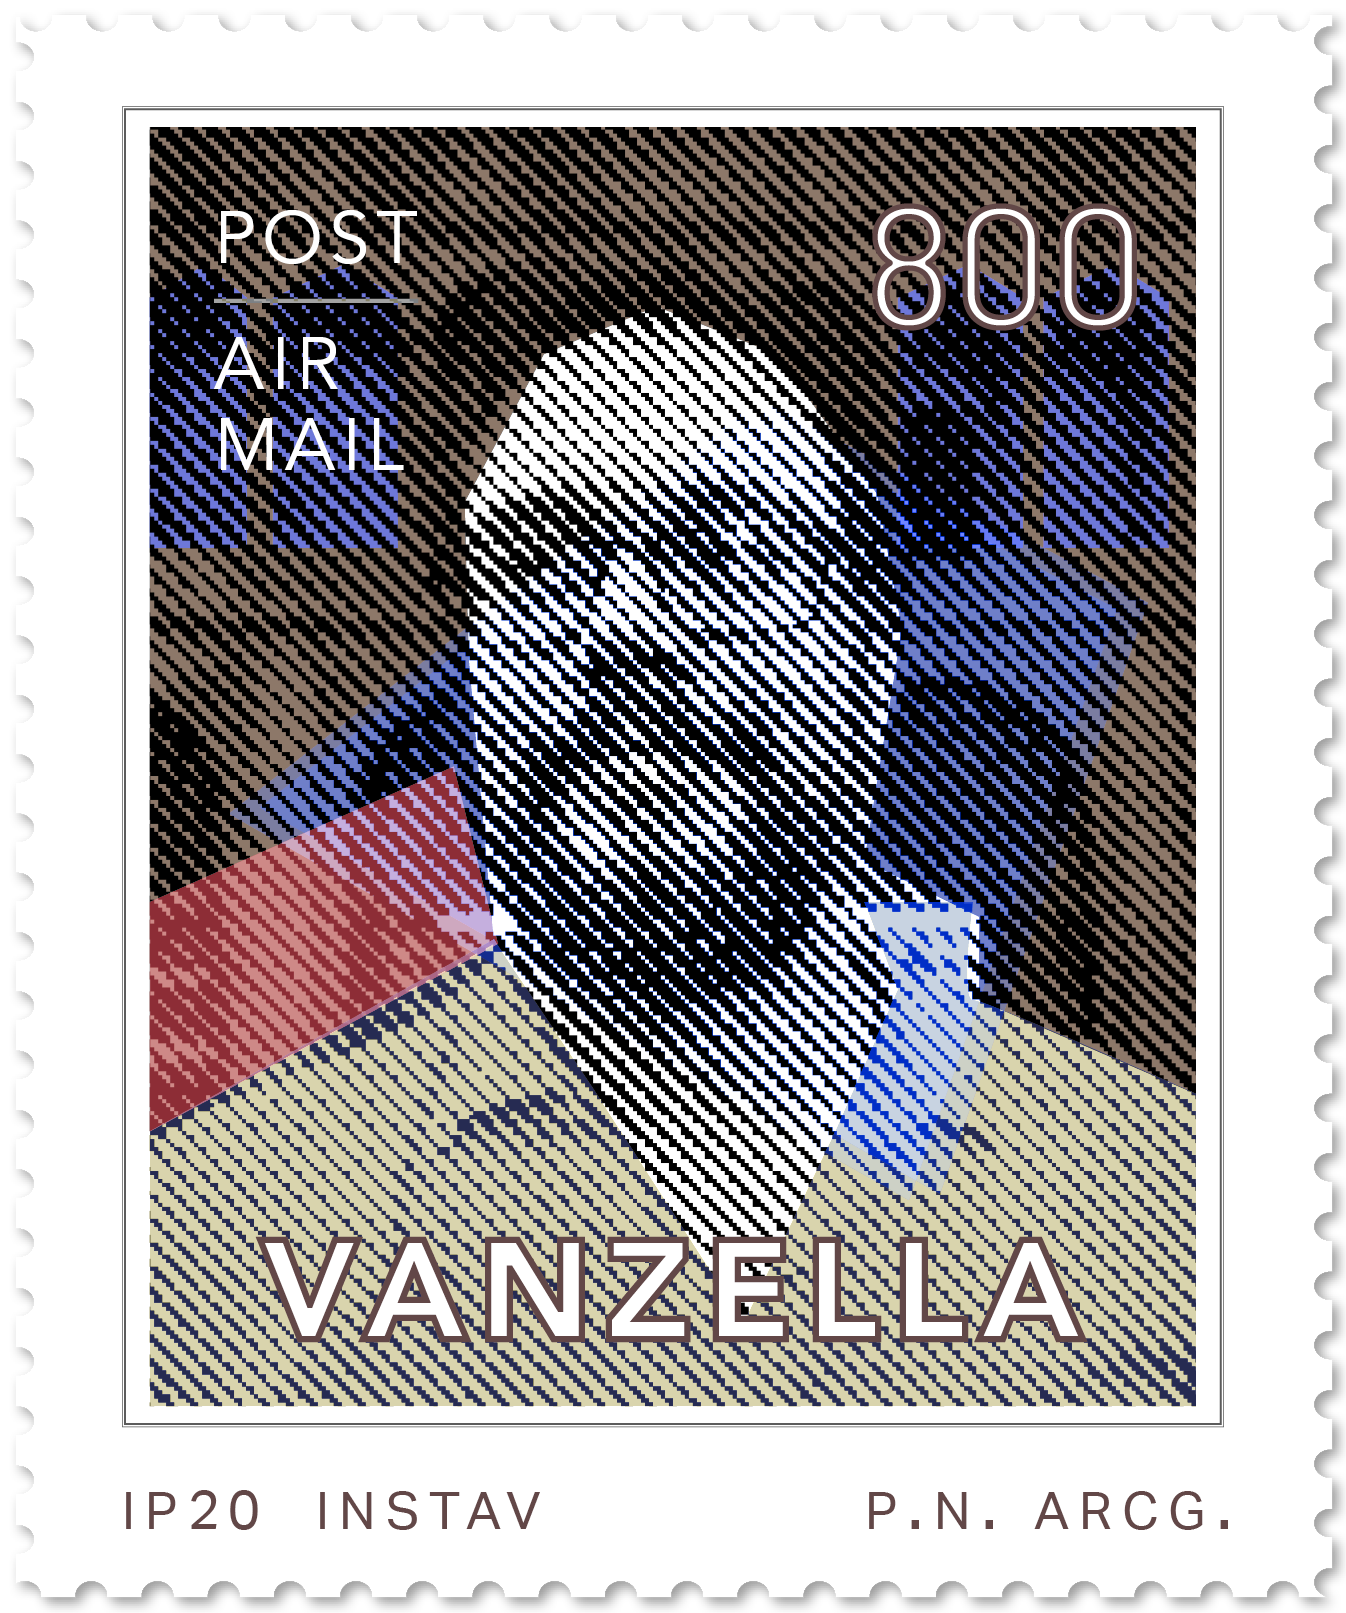 Luca Vanzella